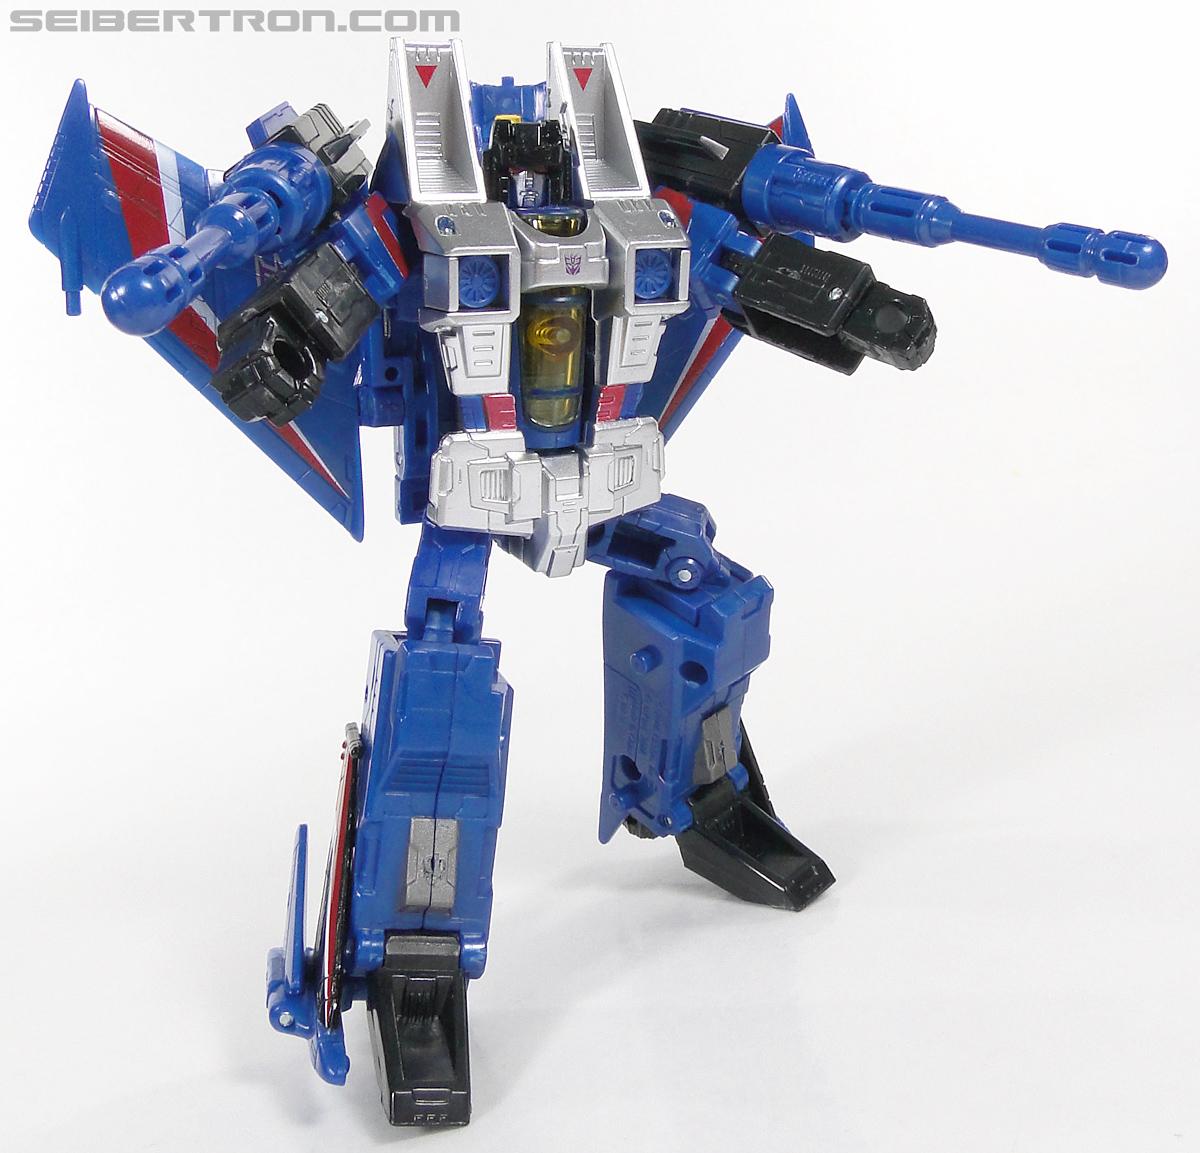 Transformers Generations Thundercracker (Image #144 of 219)